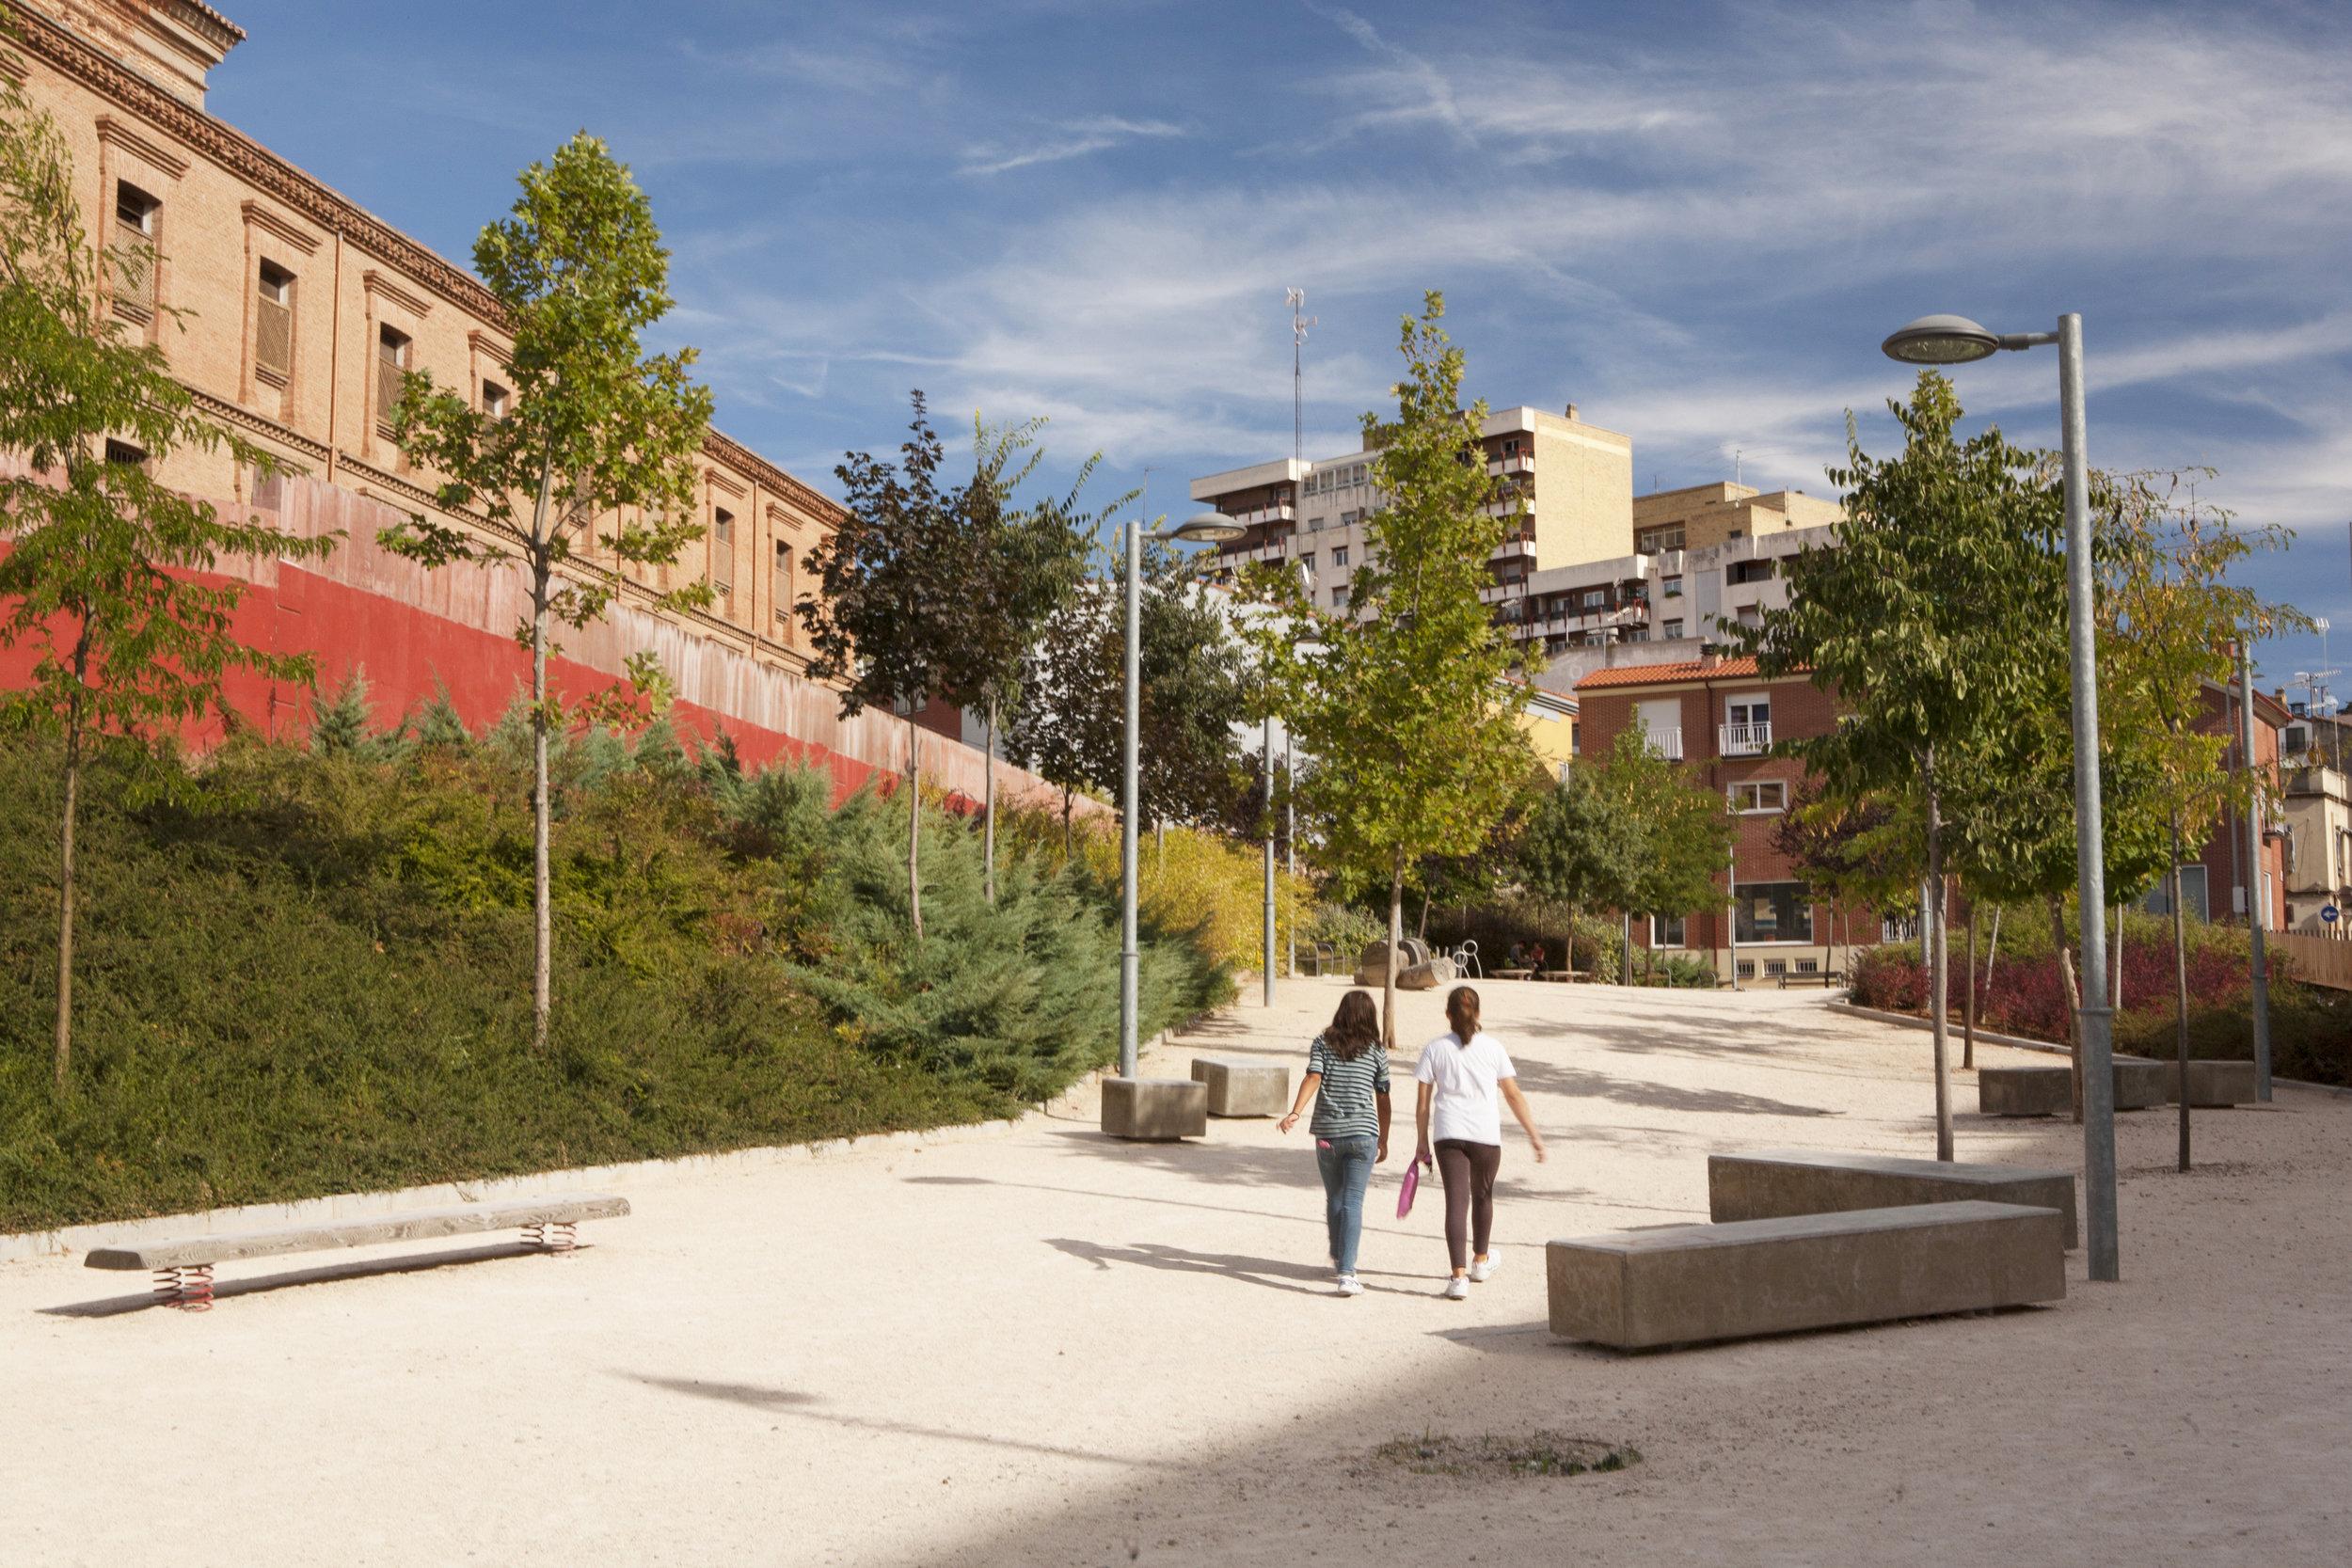 Parque del Carmen. Guadalajara, Spain